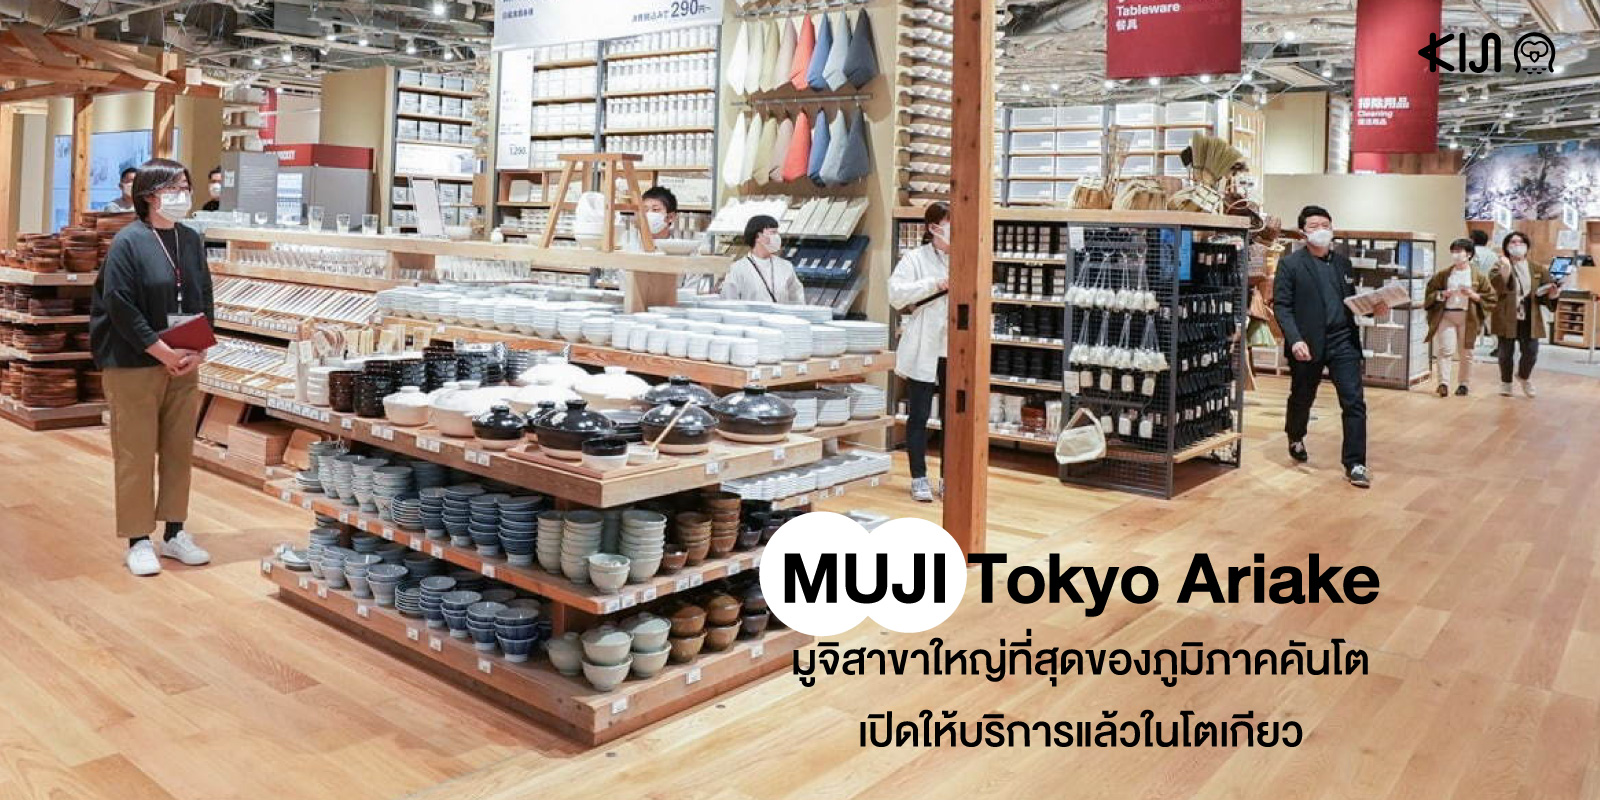 MUJI Tokyo Ariake สาขาที่ใหญ่ที่สุด สวรรค์ของเหล่าคนรัก muji ที่ครบครันตั้งแต่อุปกรณ์เครื่องใช้ไปจนถึงของแต่งบ้าน